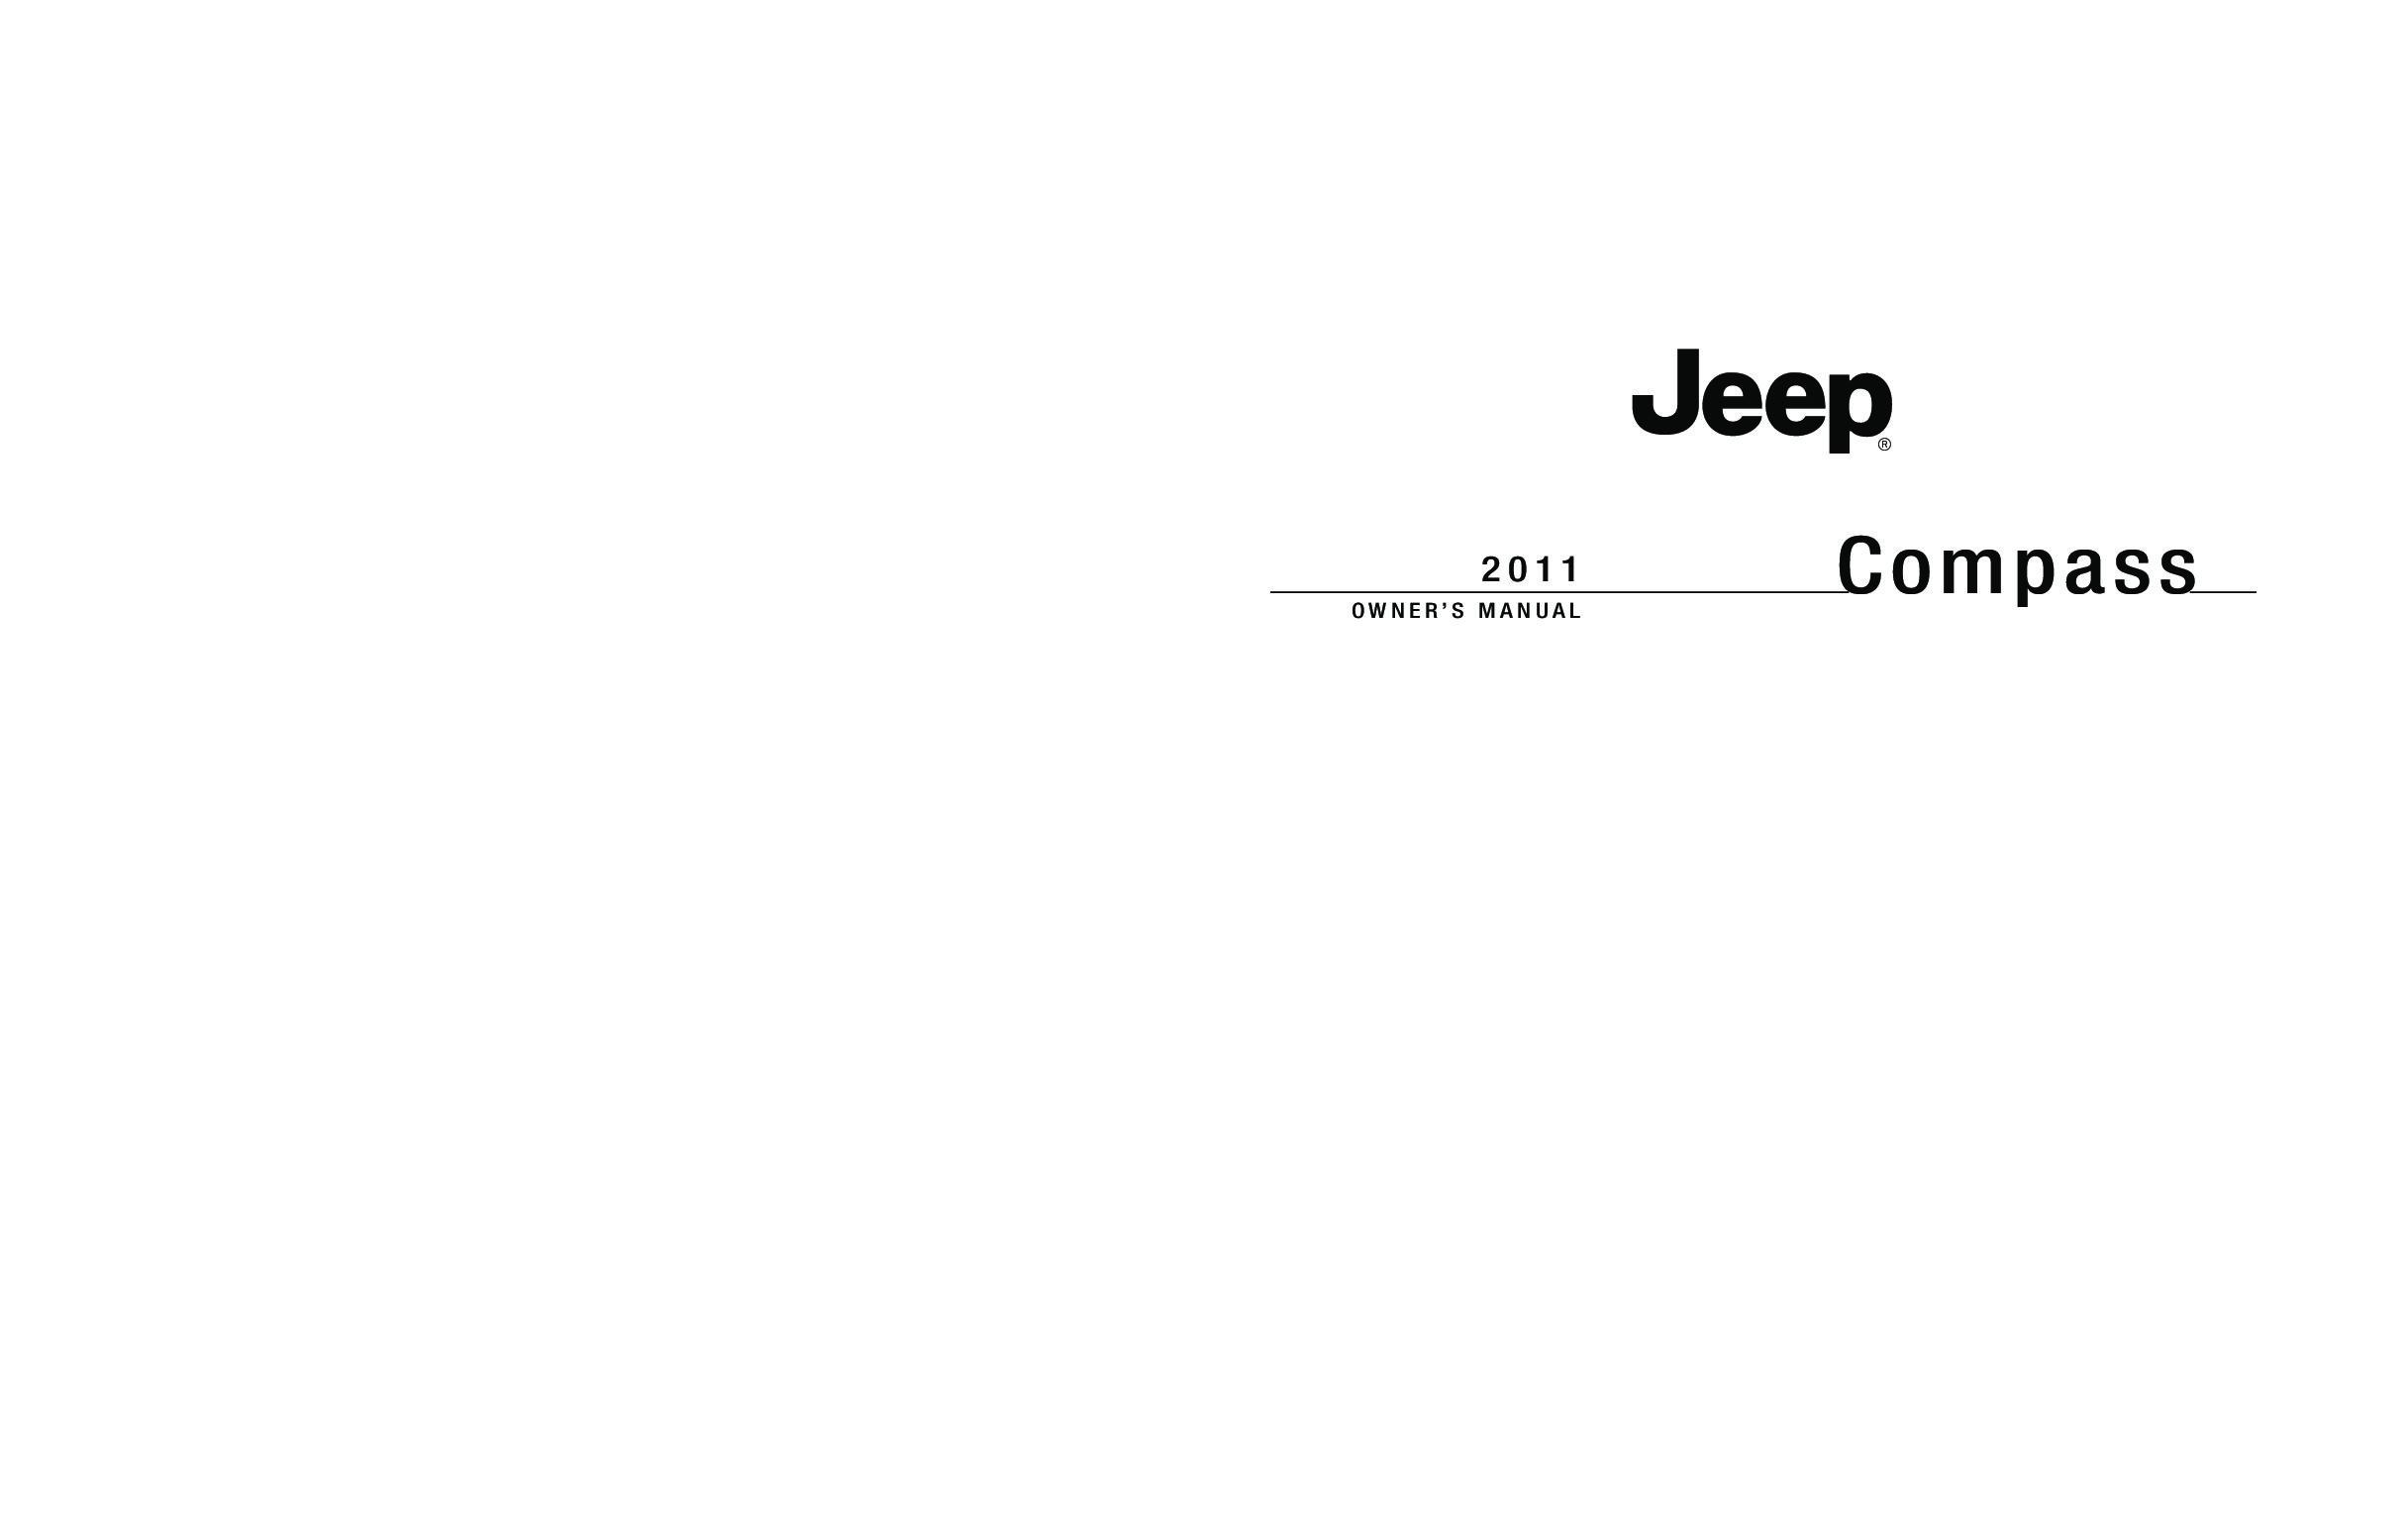 2008 jeep compass owners manual: jeep: amazon. Com: books.